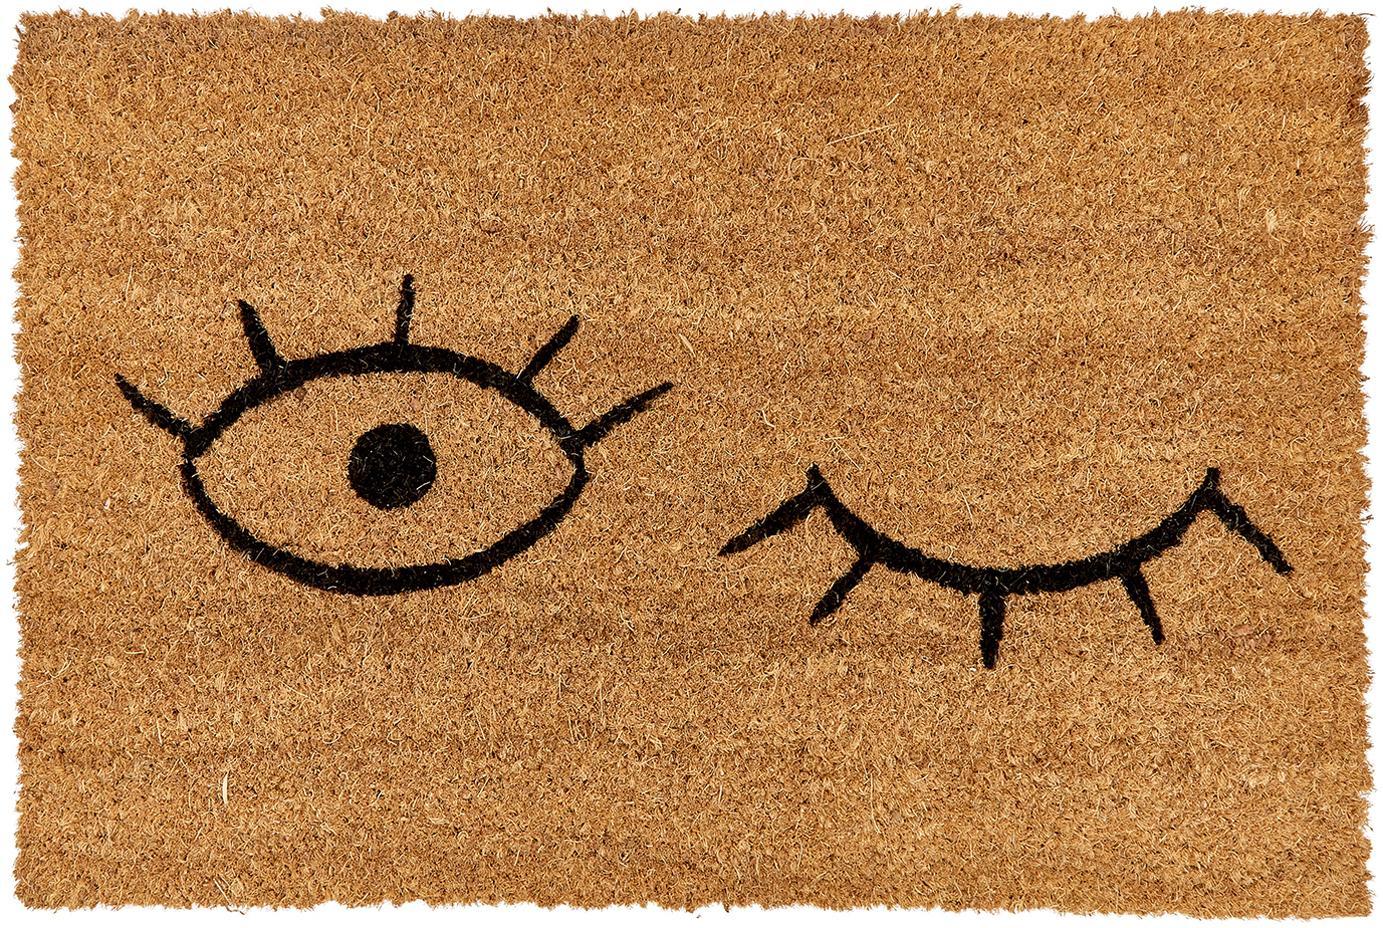 Felpudo Wink, Parte superior: fibras de coco, Reverso: plástico (PVC), Parte superior: beige, negro Reverso: negro, An 40 x L 60 cm